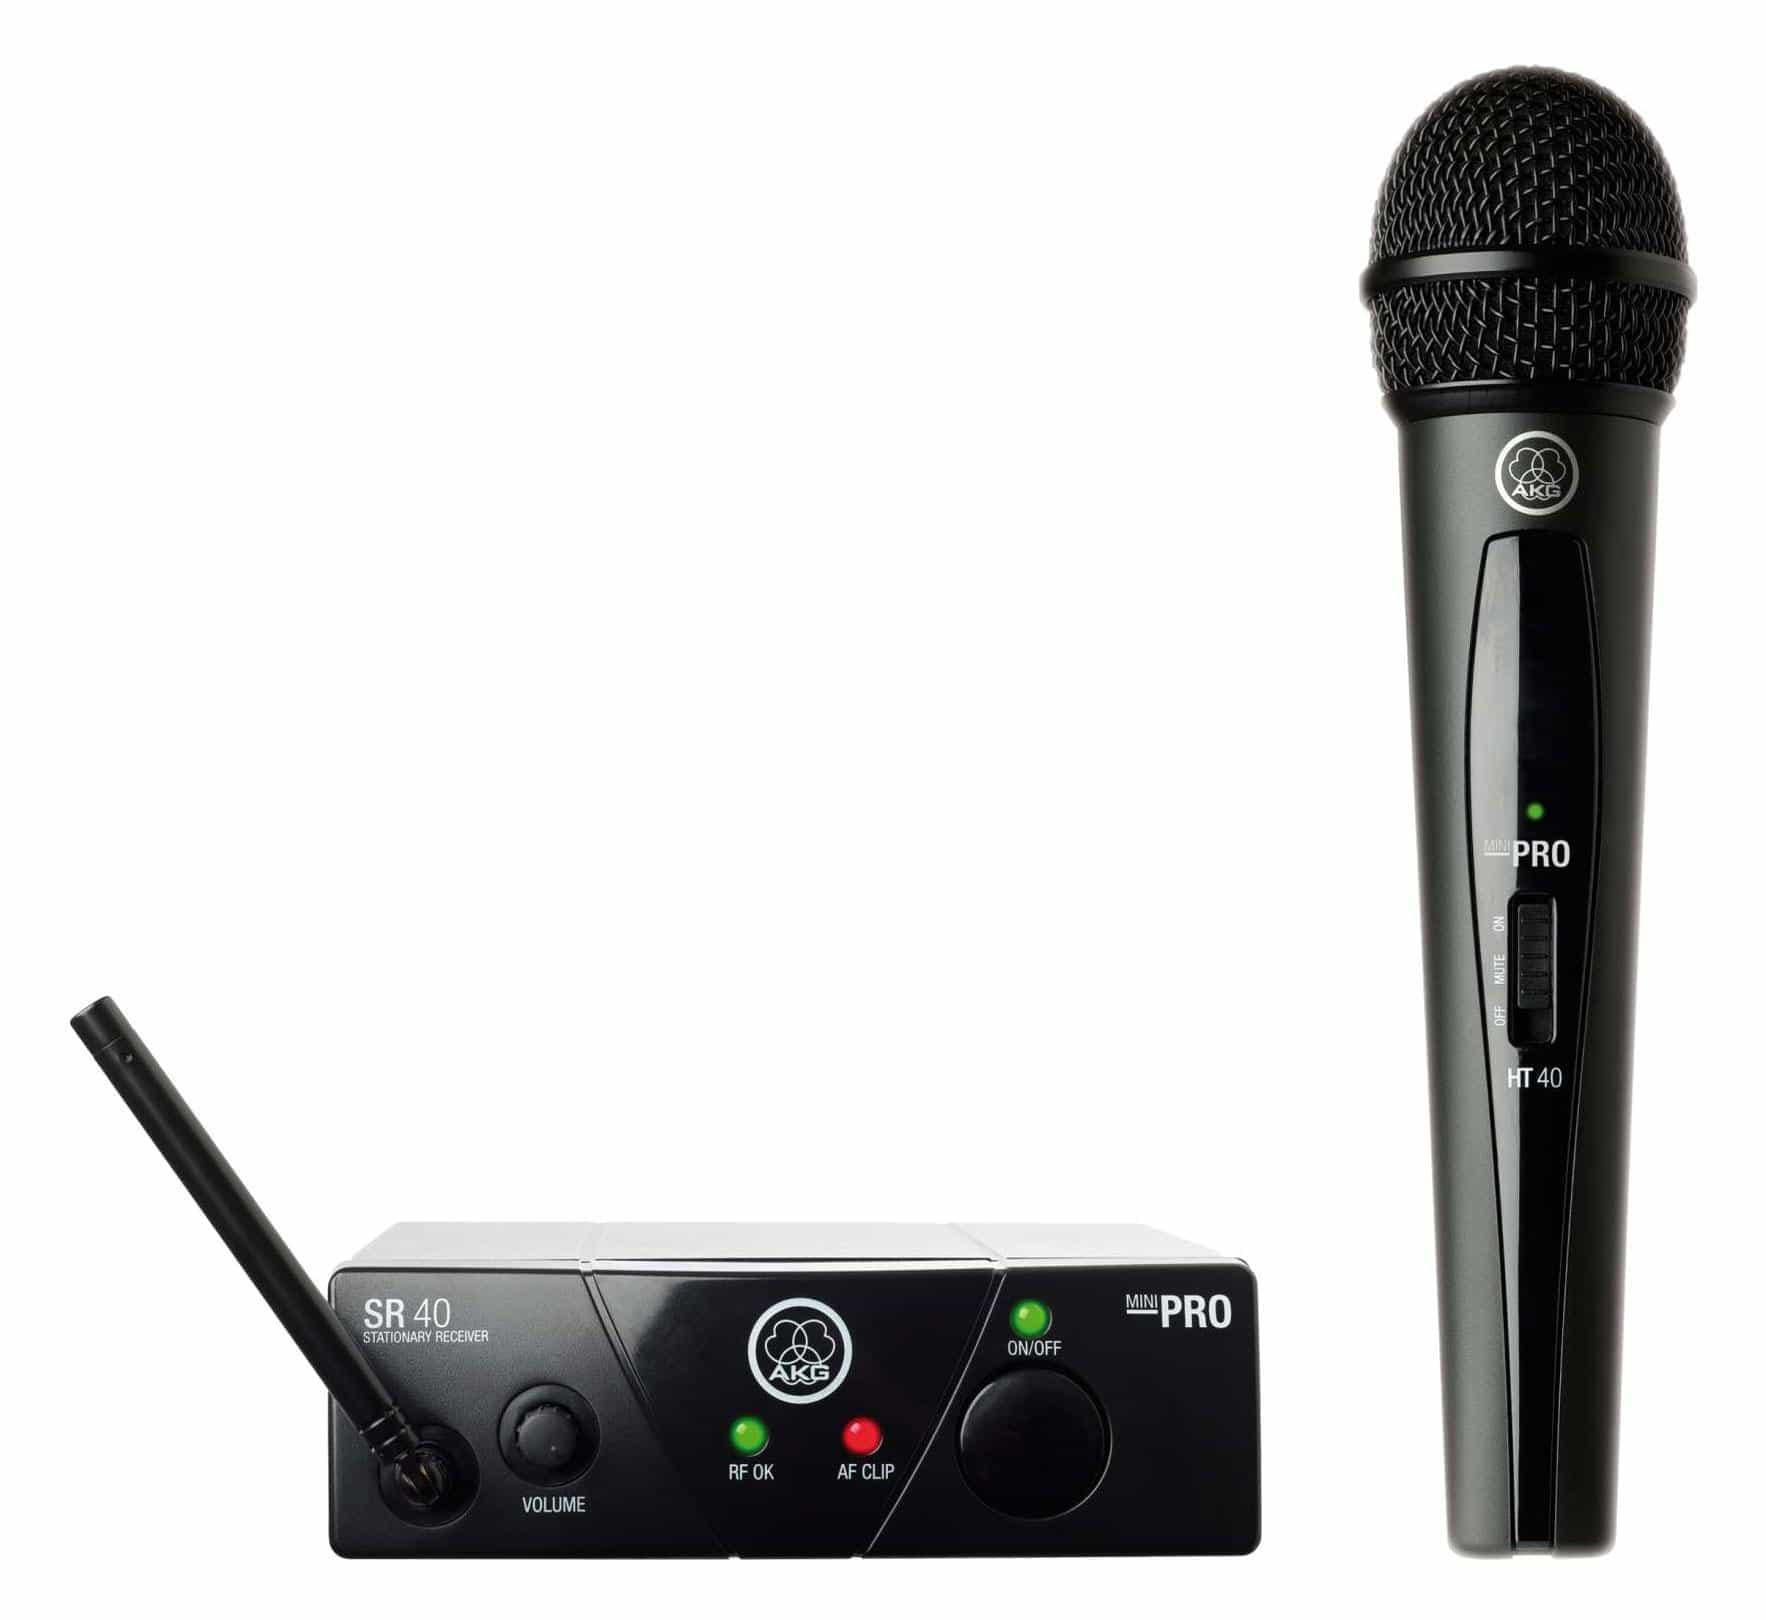 Mikrofone - AKG WMS 40 Mini Vocal Handfunkmikrofon Set ISM2 864,375 MHz Retoure (Zustand sehr gut) - Onlineshop Musikhaus Kirstein